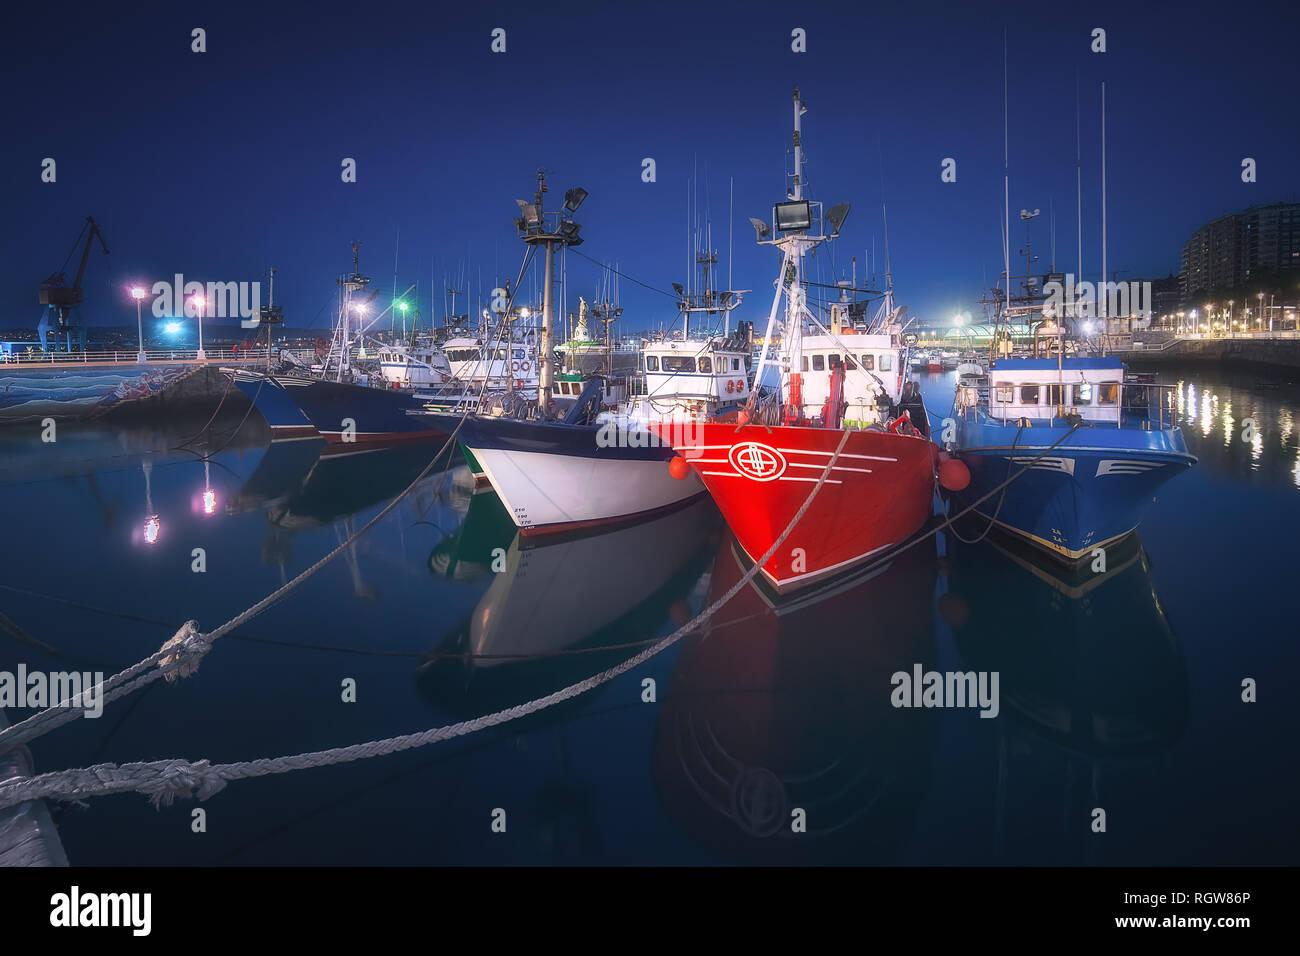 Fishing ships in Santurce port at night - Stock Image